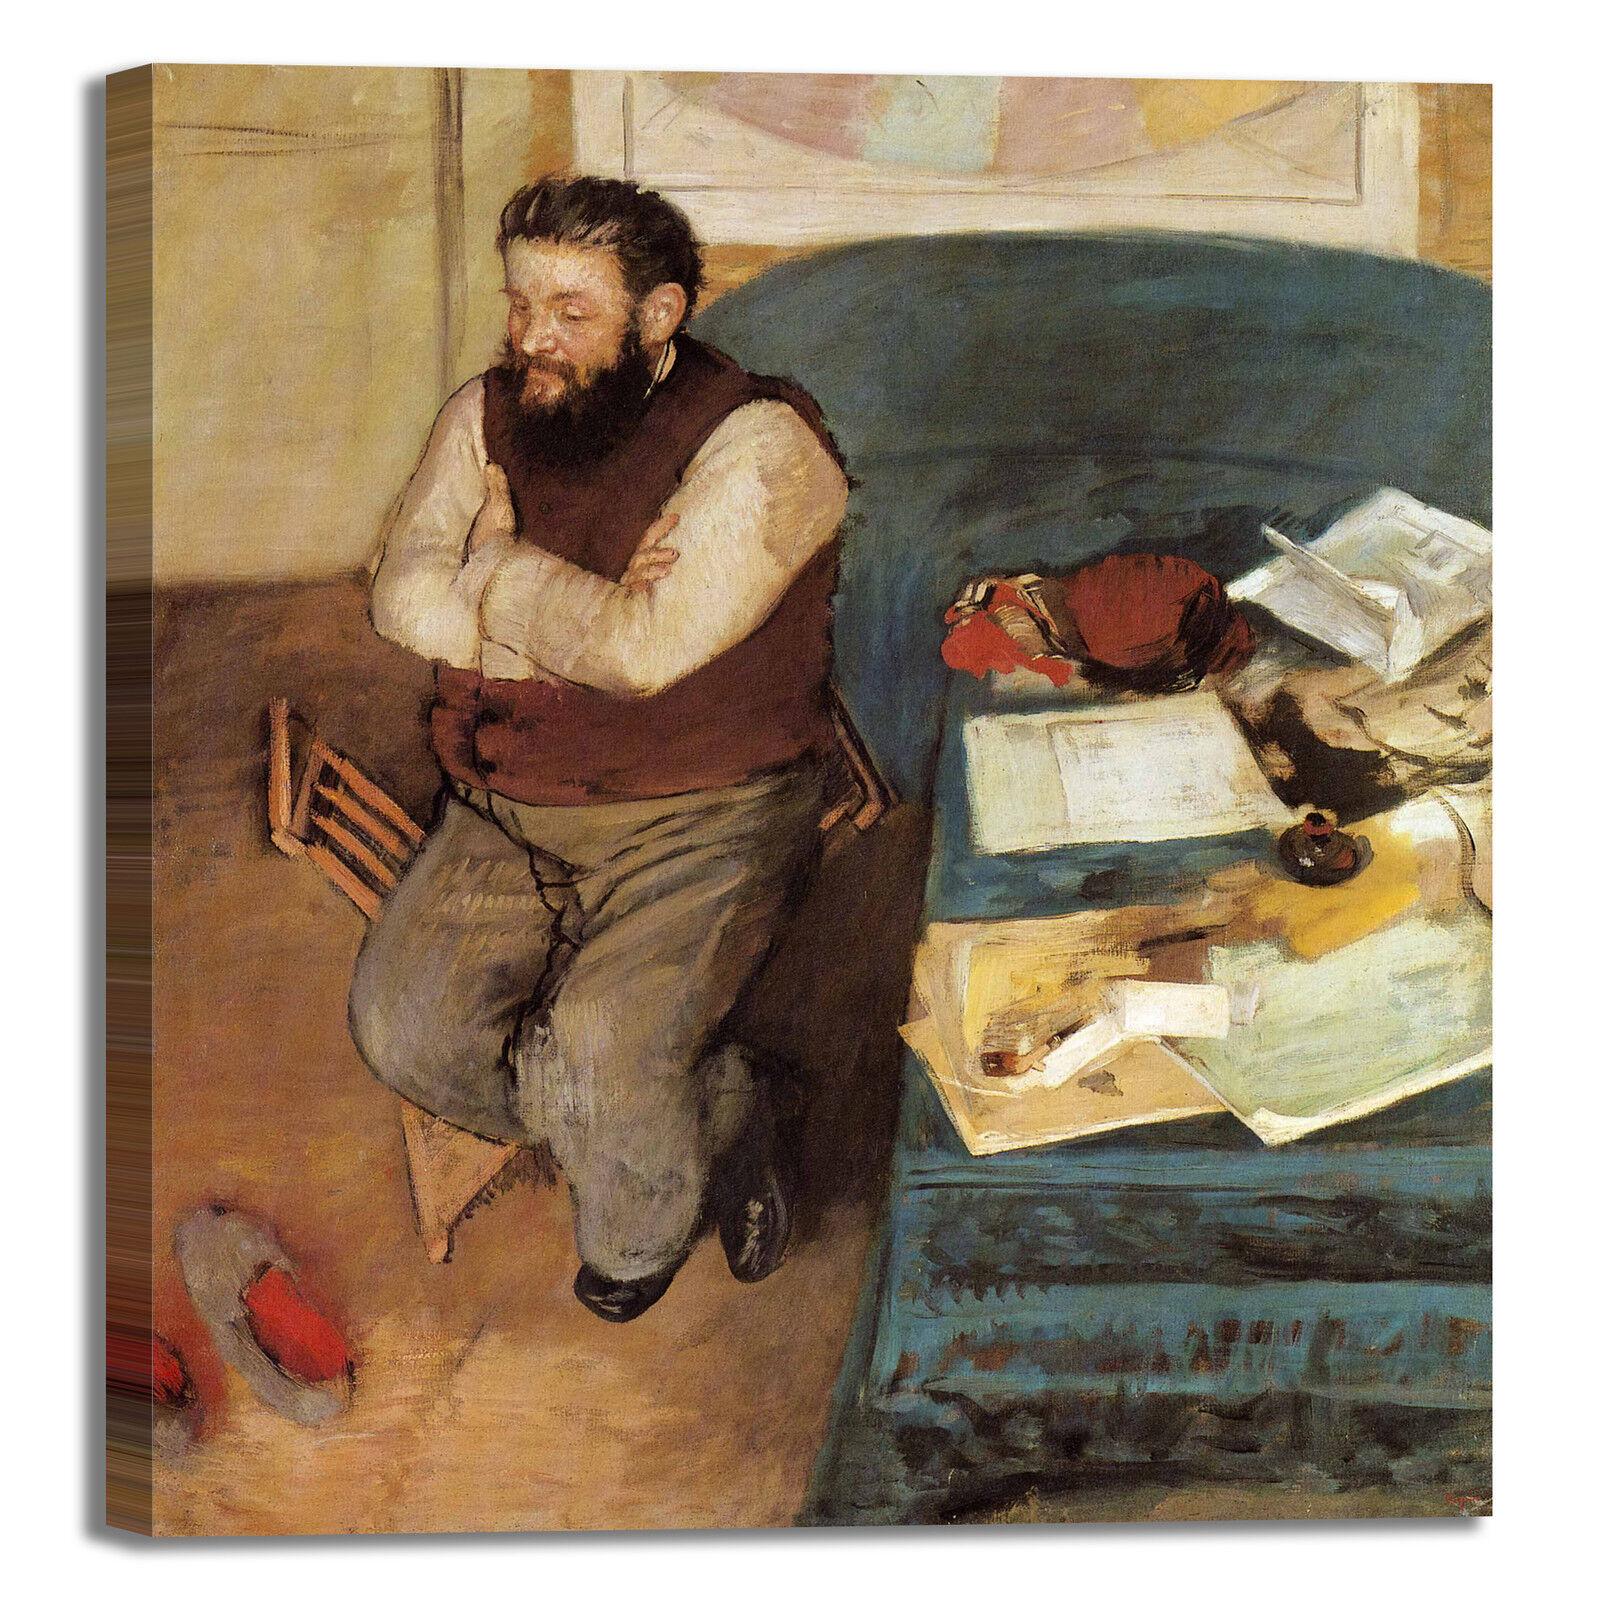 Degas Diego Martelli design quadro stampa tela tela tela dipinto telaio arrossoo casa fe84aa